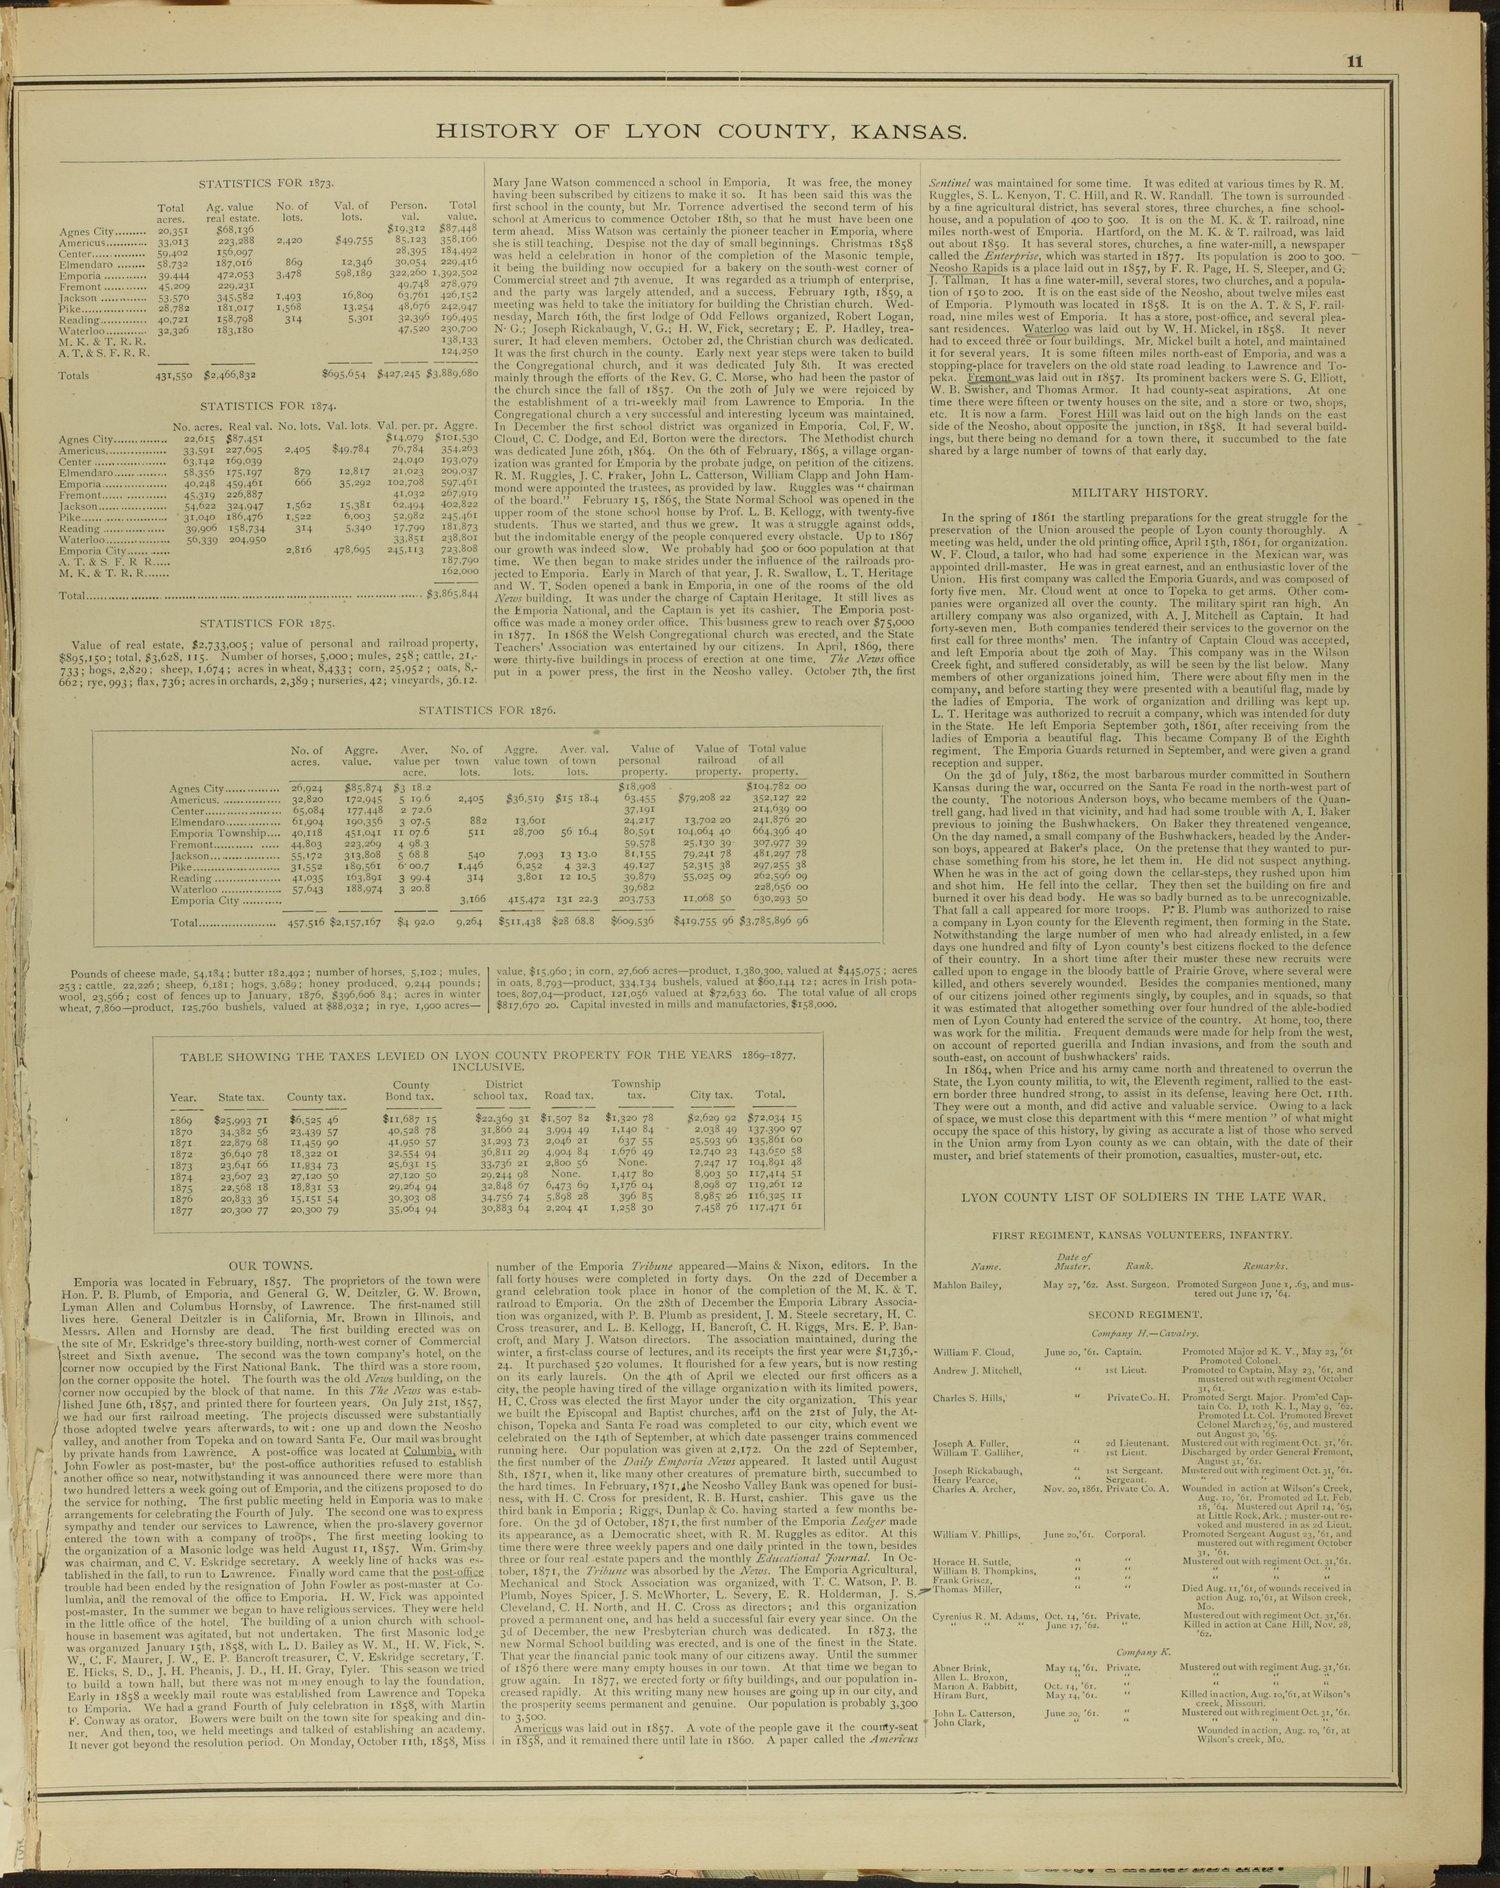 An illustrated historical atlas of Lyon county, Kansas - 11